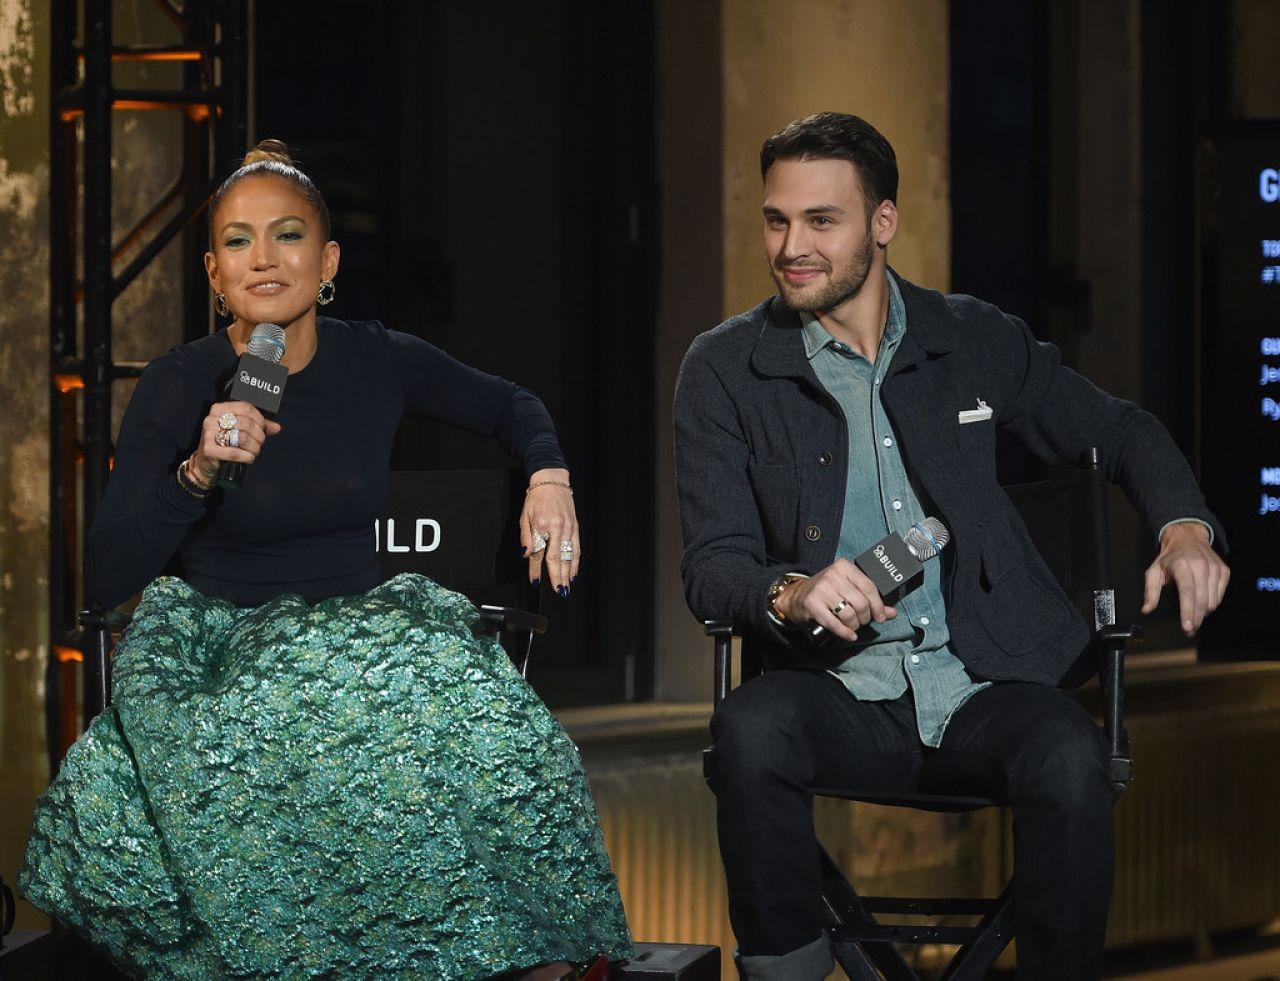 Jennifer Lopez - AOL Build Speaker Series in New York City, January 2015